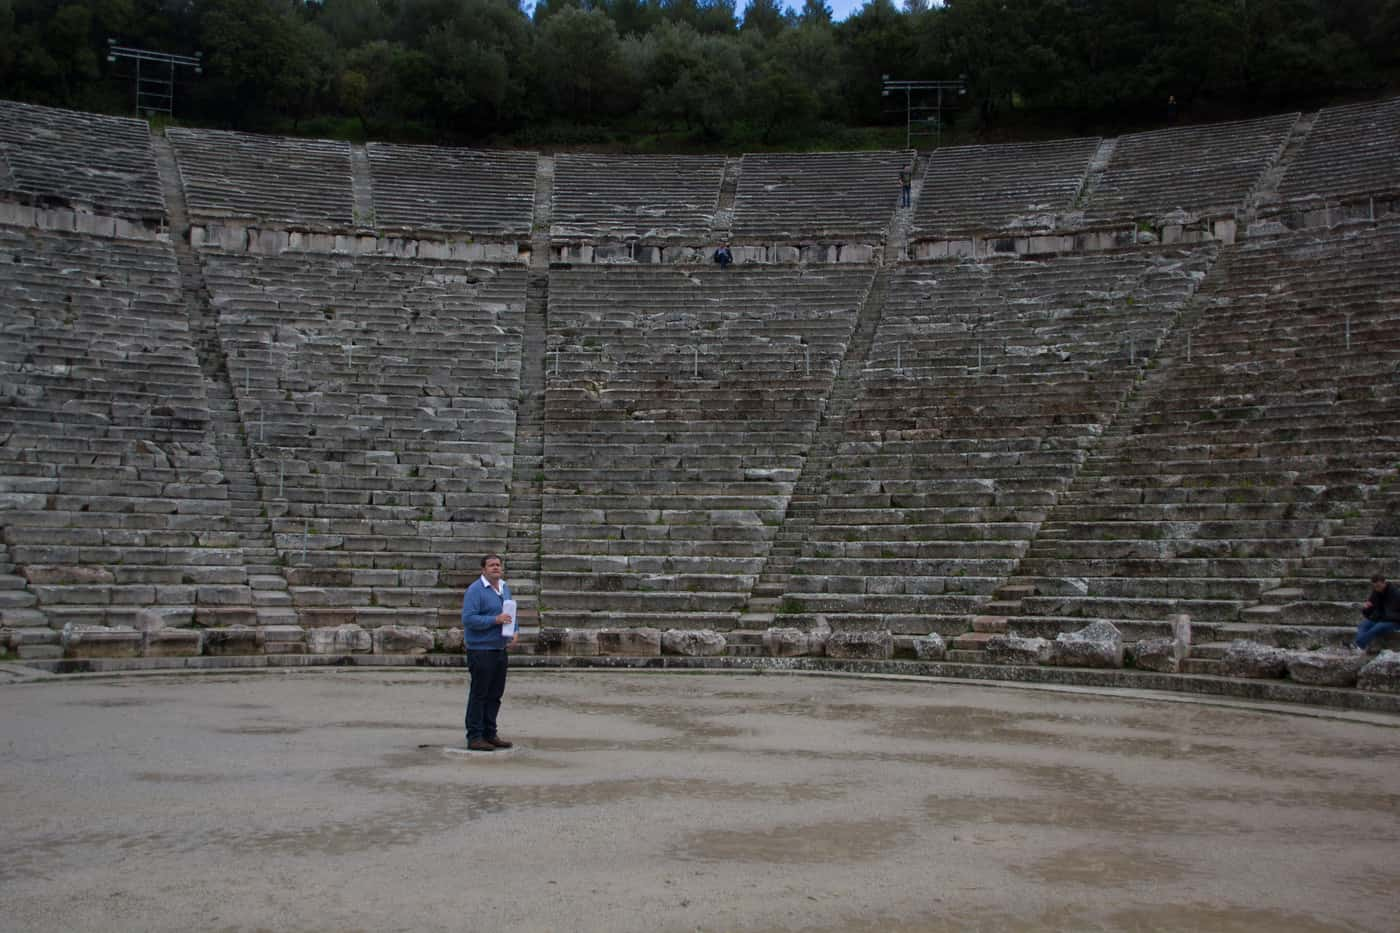 Sth Basel Studienreise Griechenland (40)